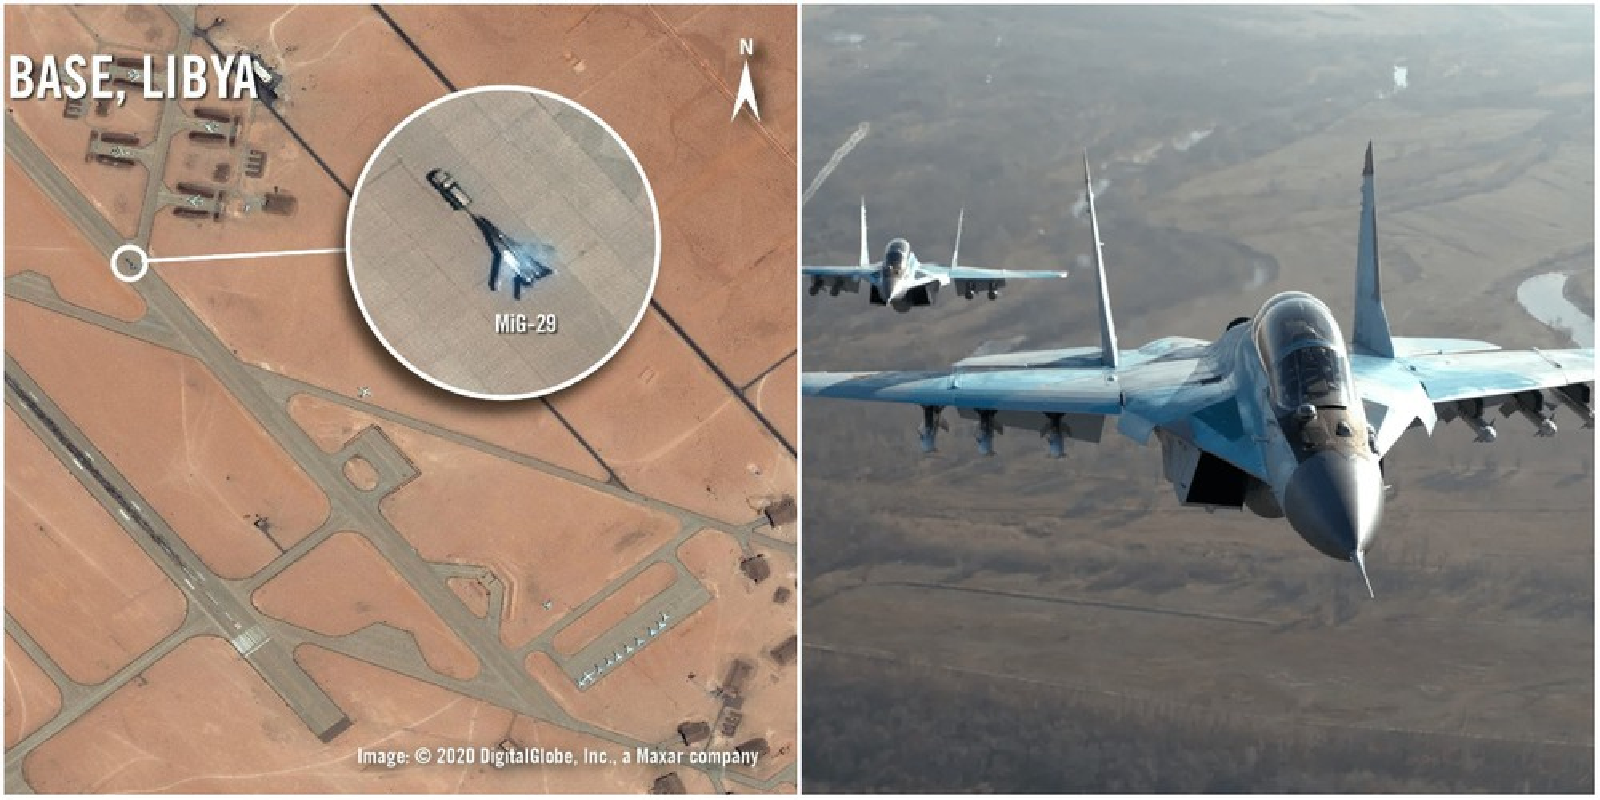 May bay nem bom T-22 Nga xuat hien o Libya khien My kinh ngac-Hinh-2